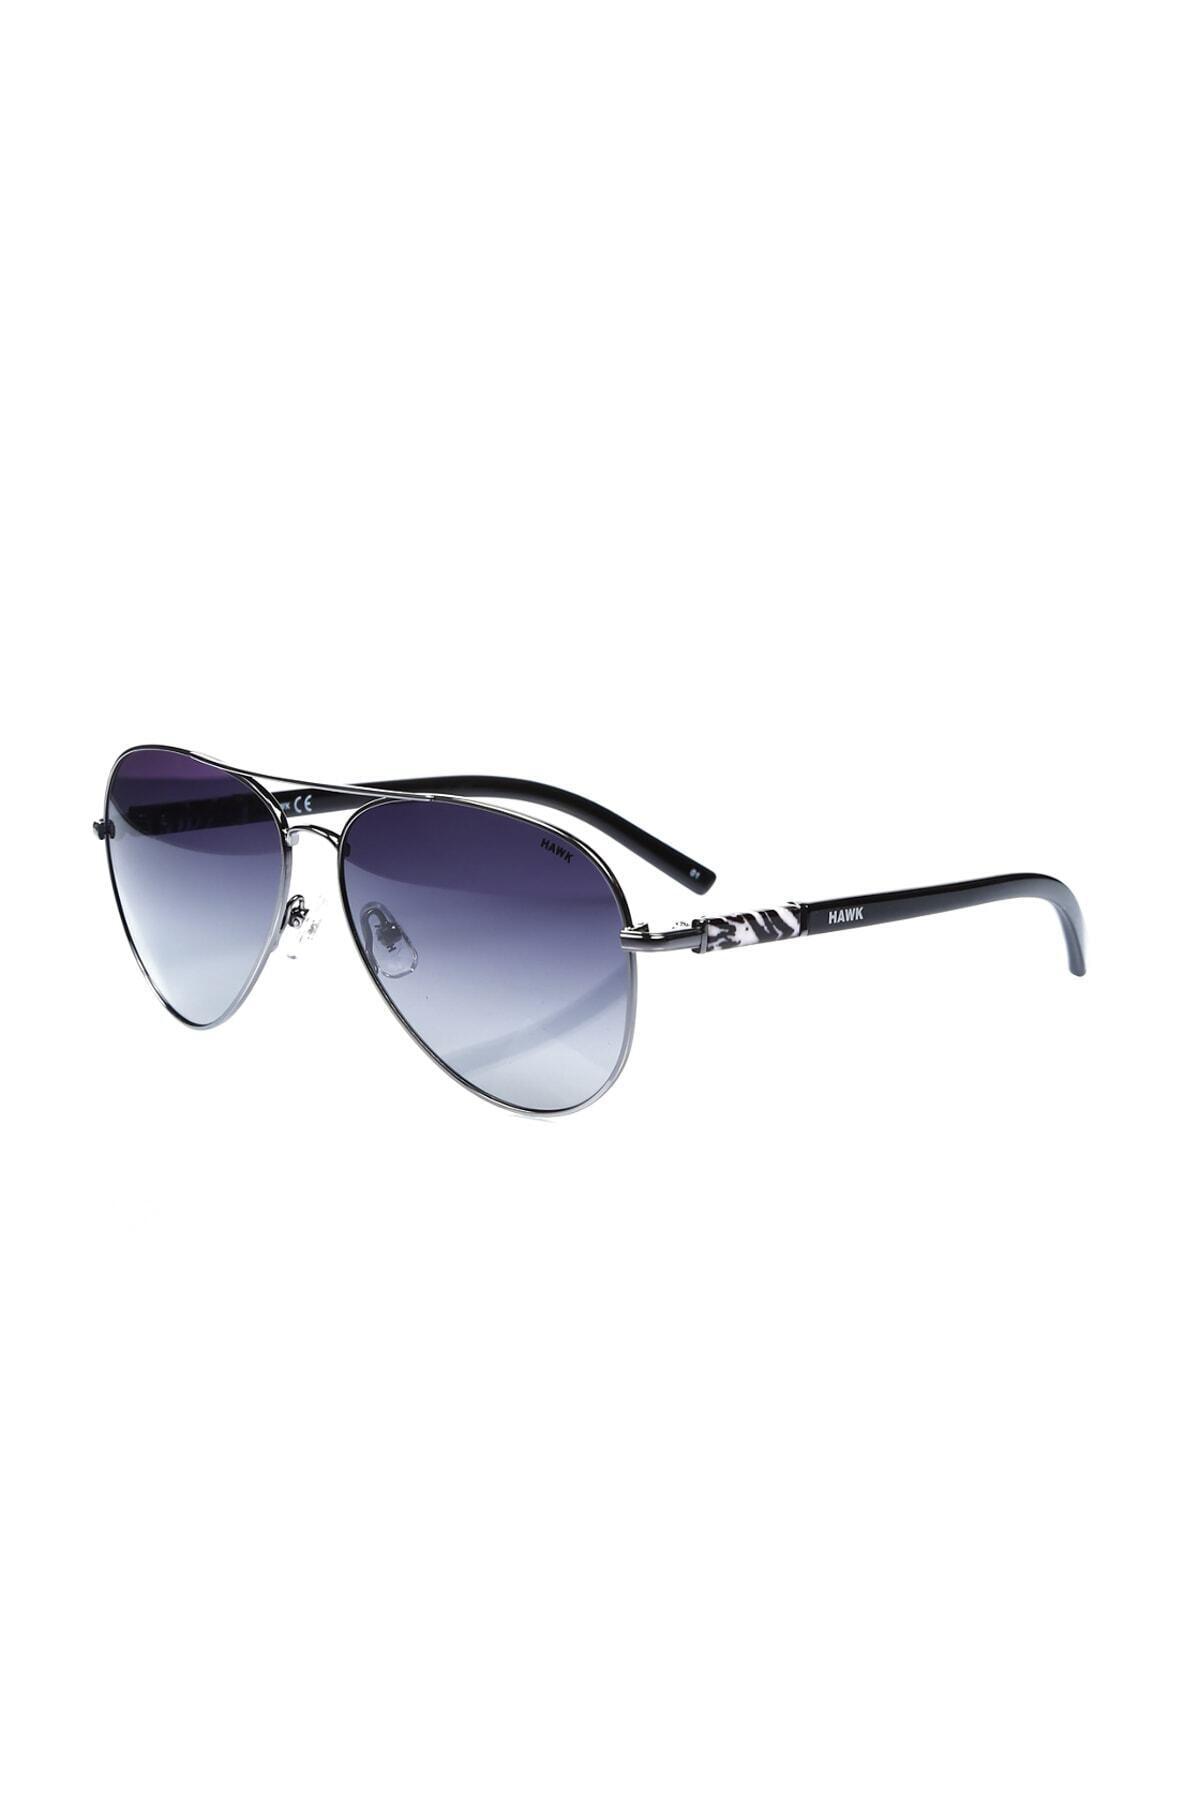 عینک دودی مردانه فروش برند HAWK کد ty6789400